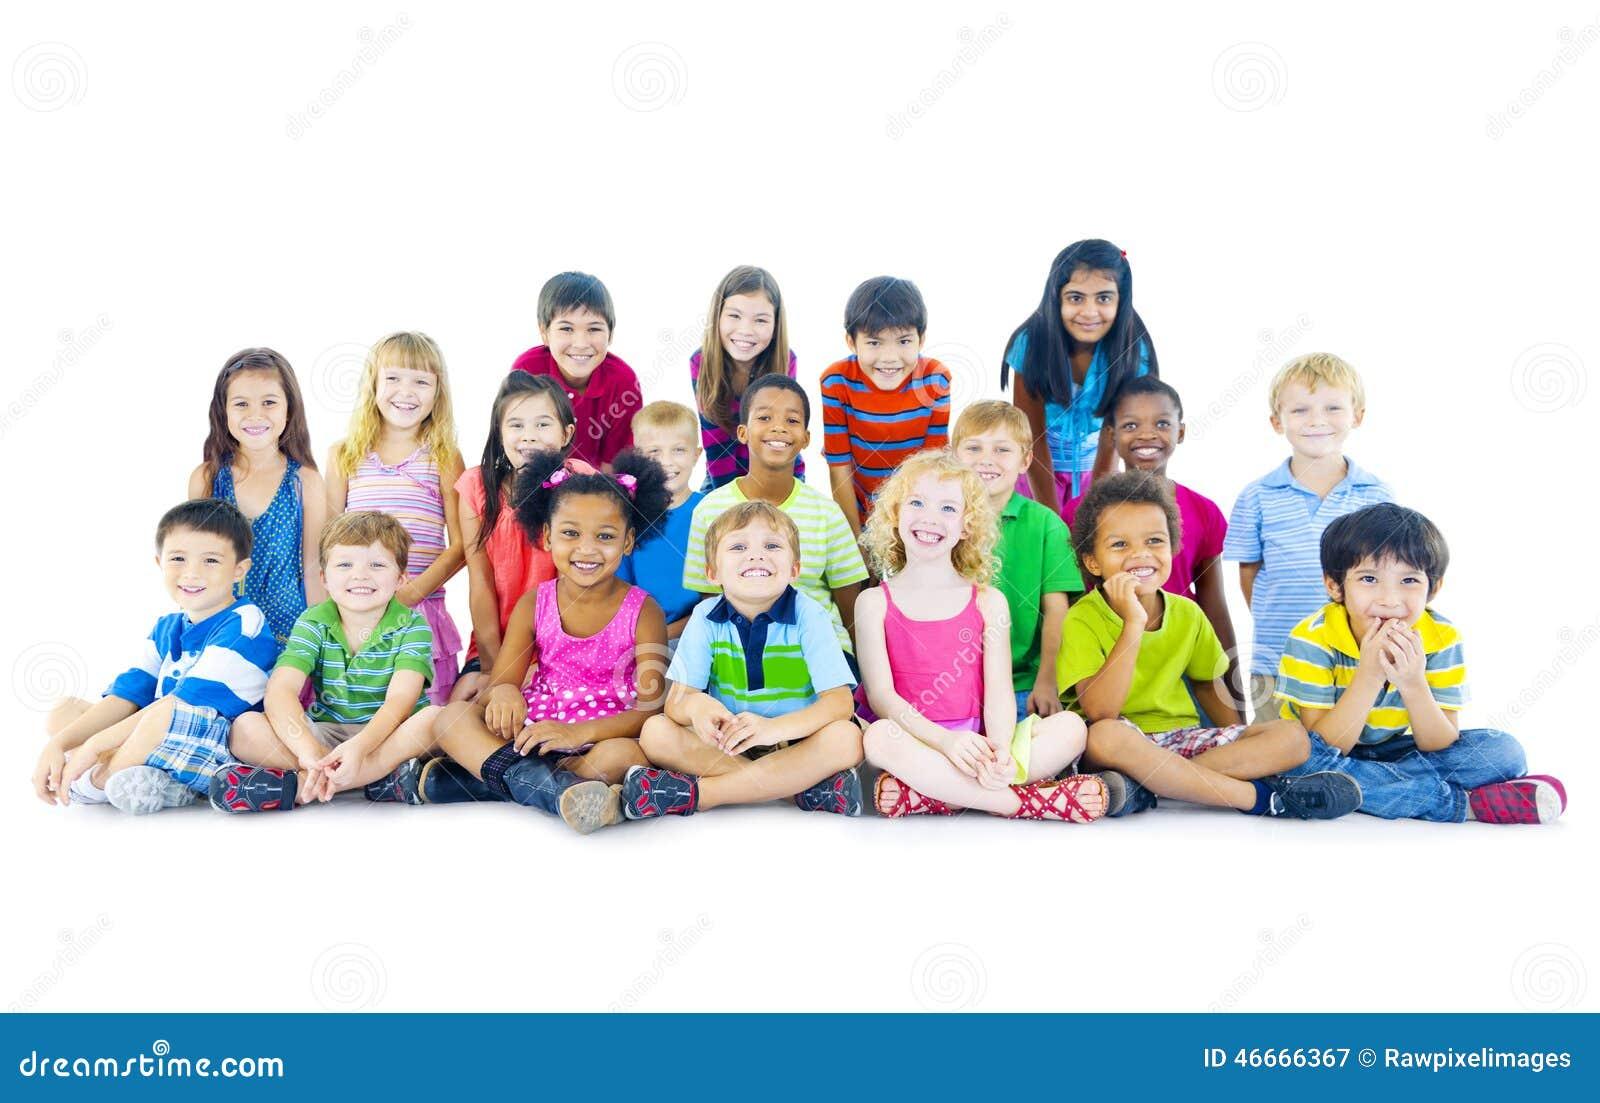 Multi-ethnic Group Of Children Sitting Stock Image - Image ...